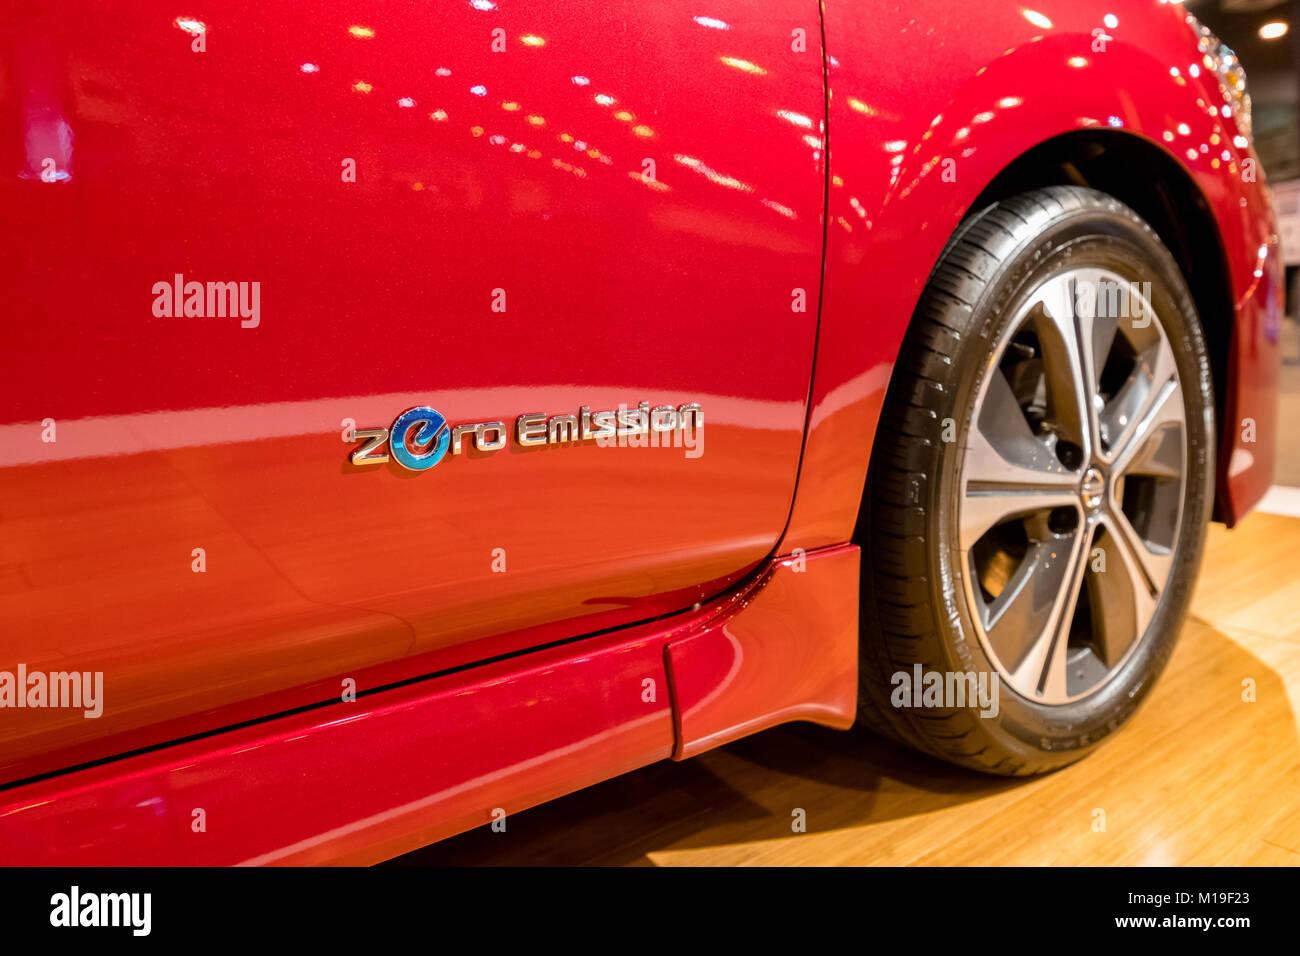 Nissan leaf battery stock photos nissan leaf battery for A m motors houston tx